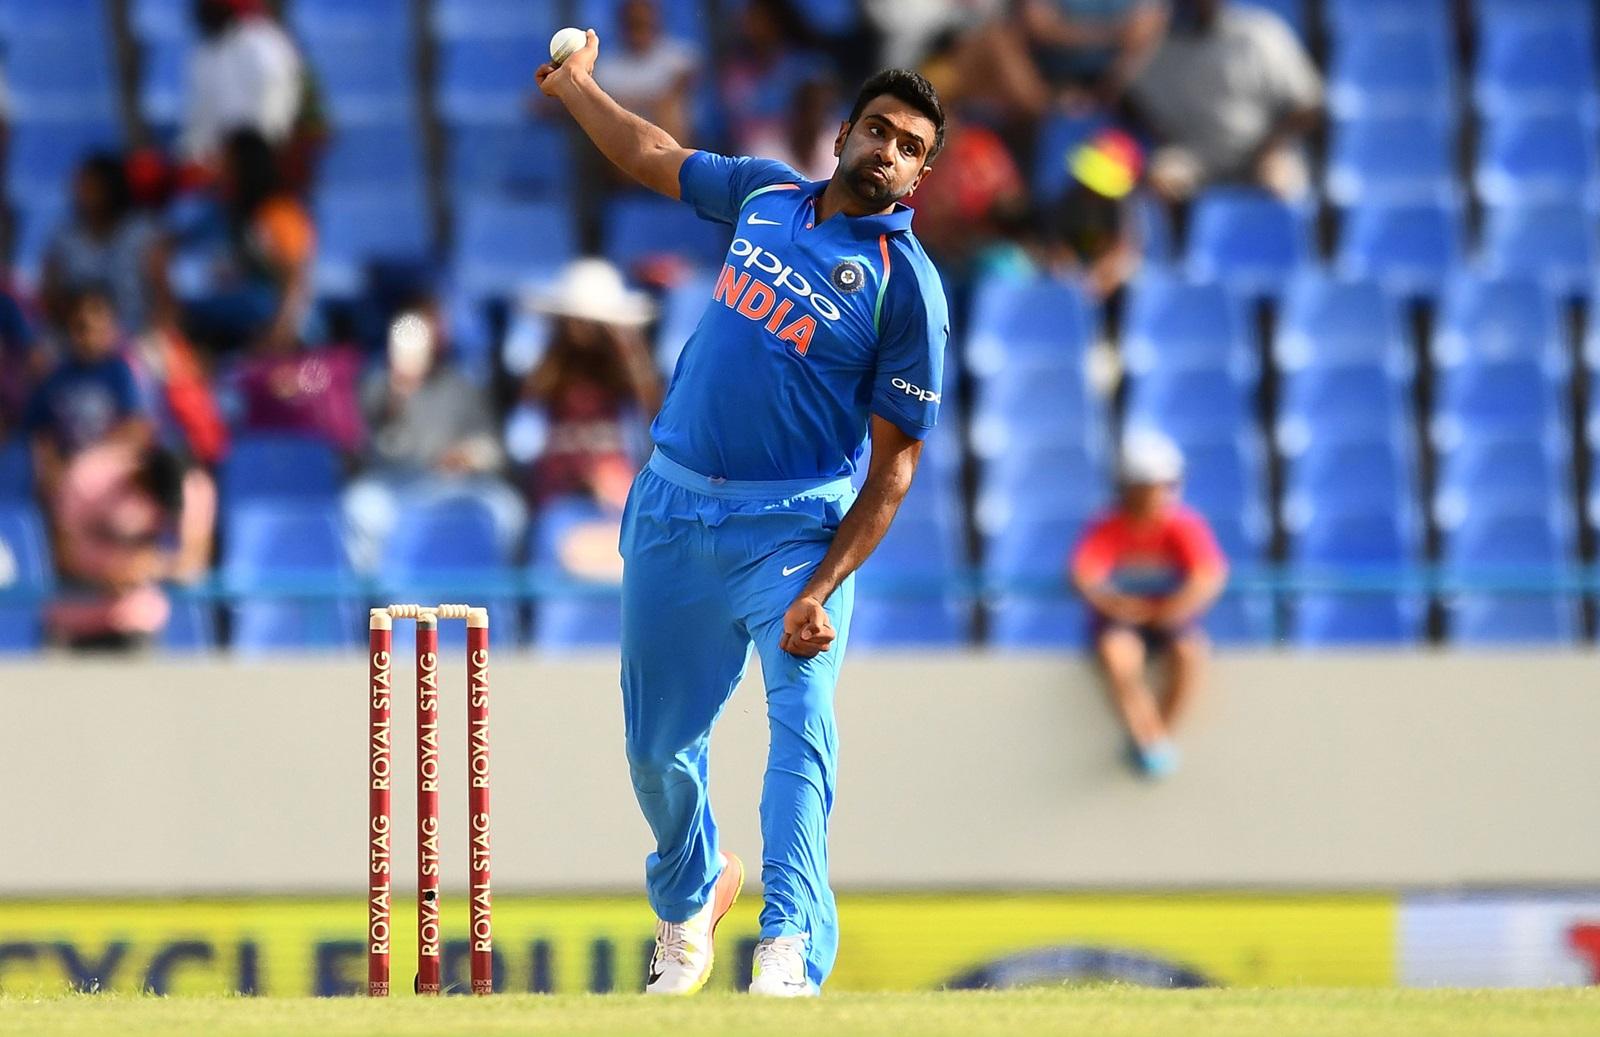 Ravichandran Ashwin, Best Bowling Figures For India